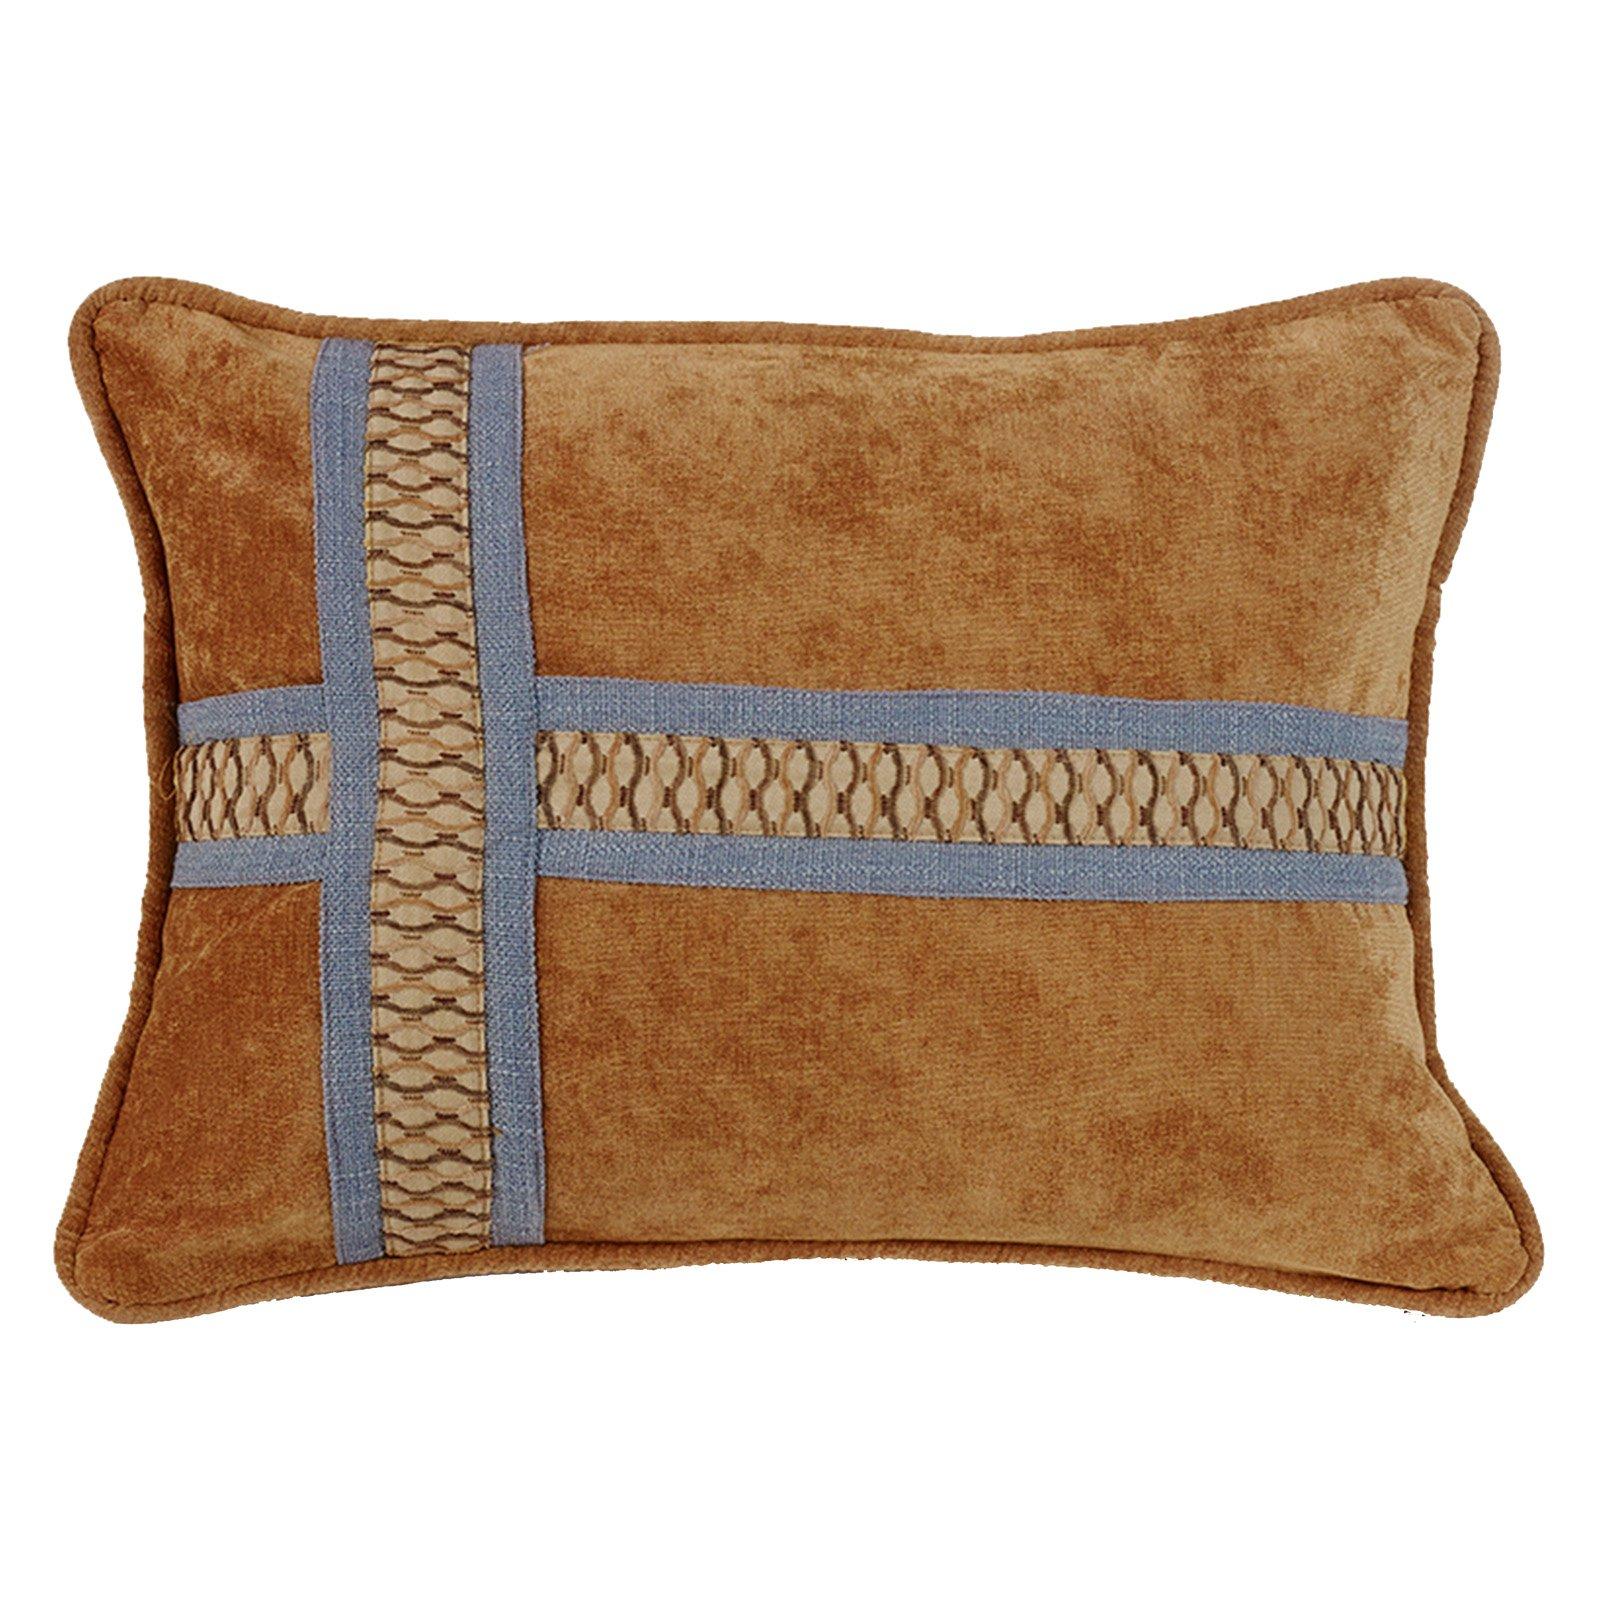 HiEnd Accents Brown Cross Design Pillow